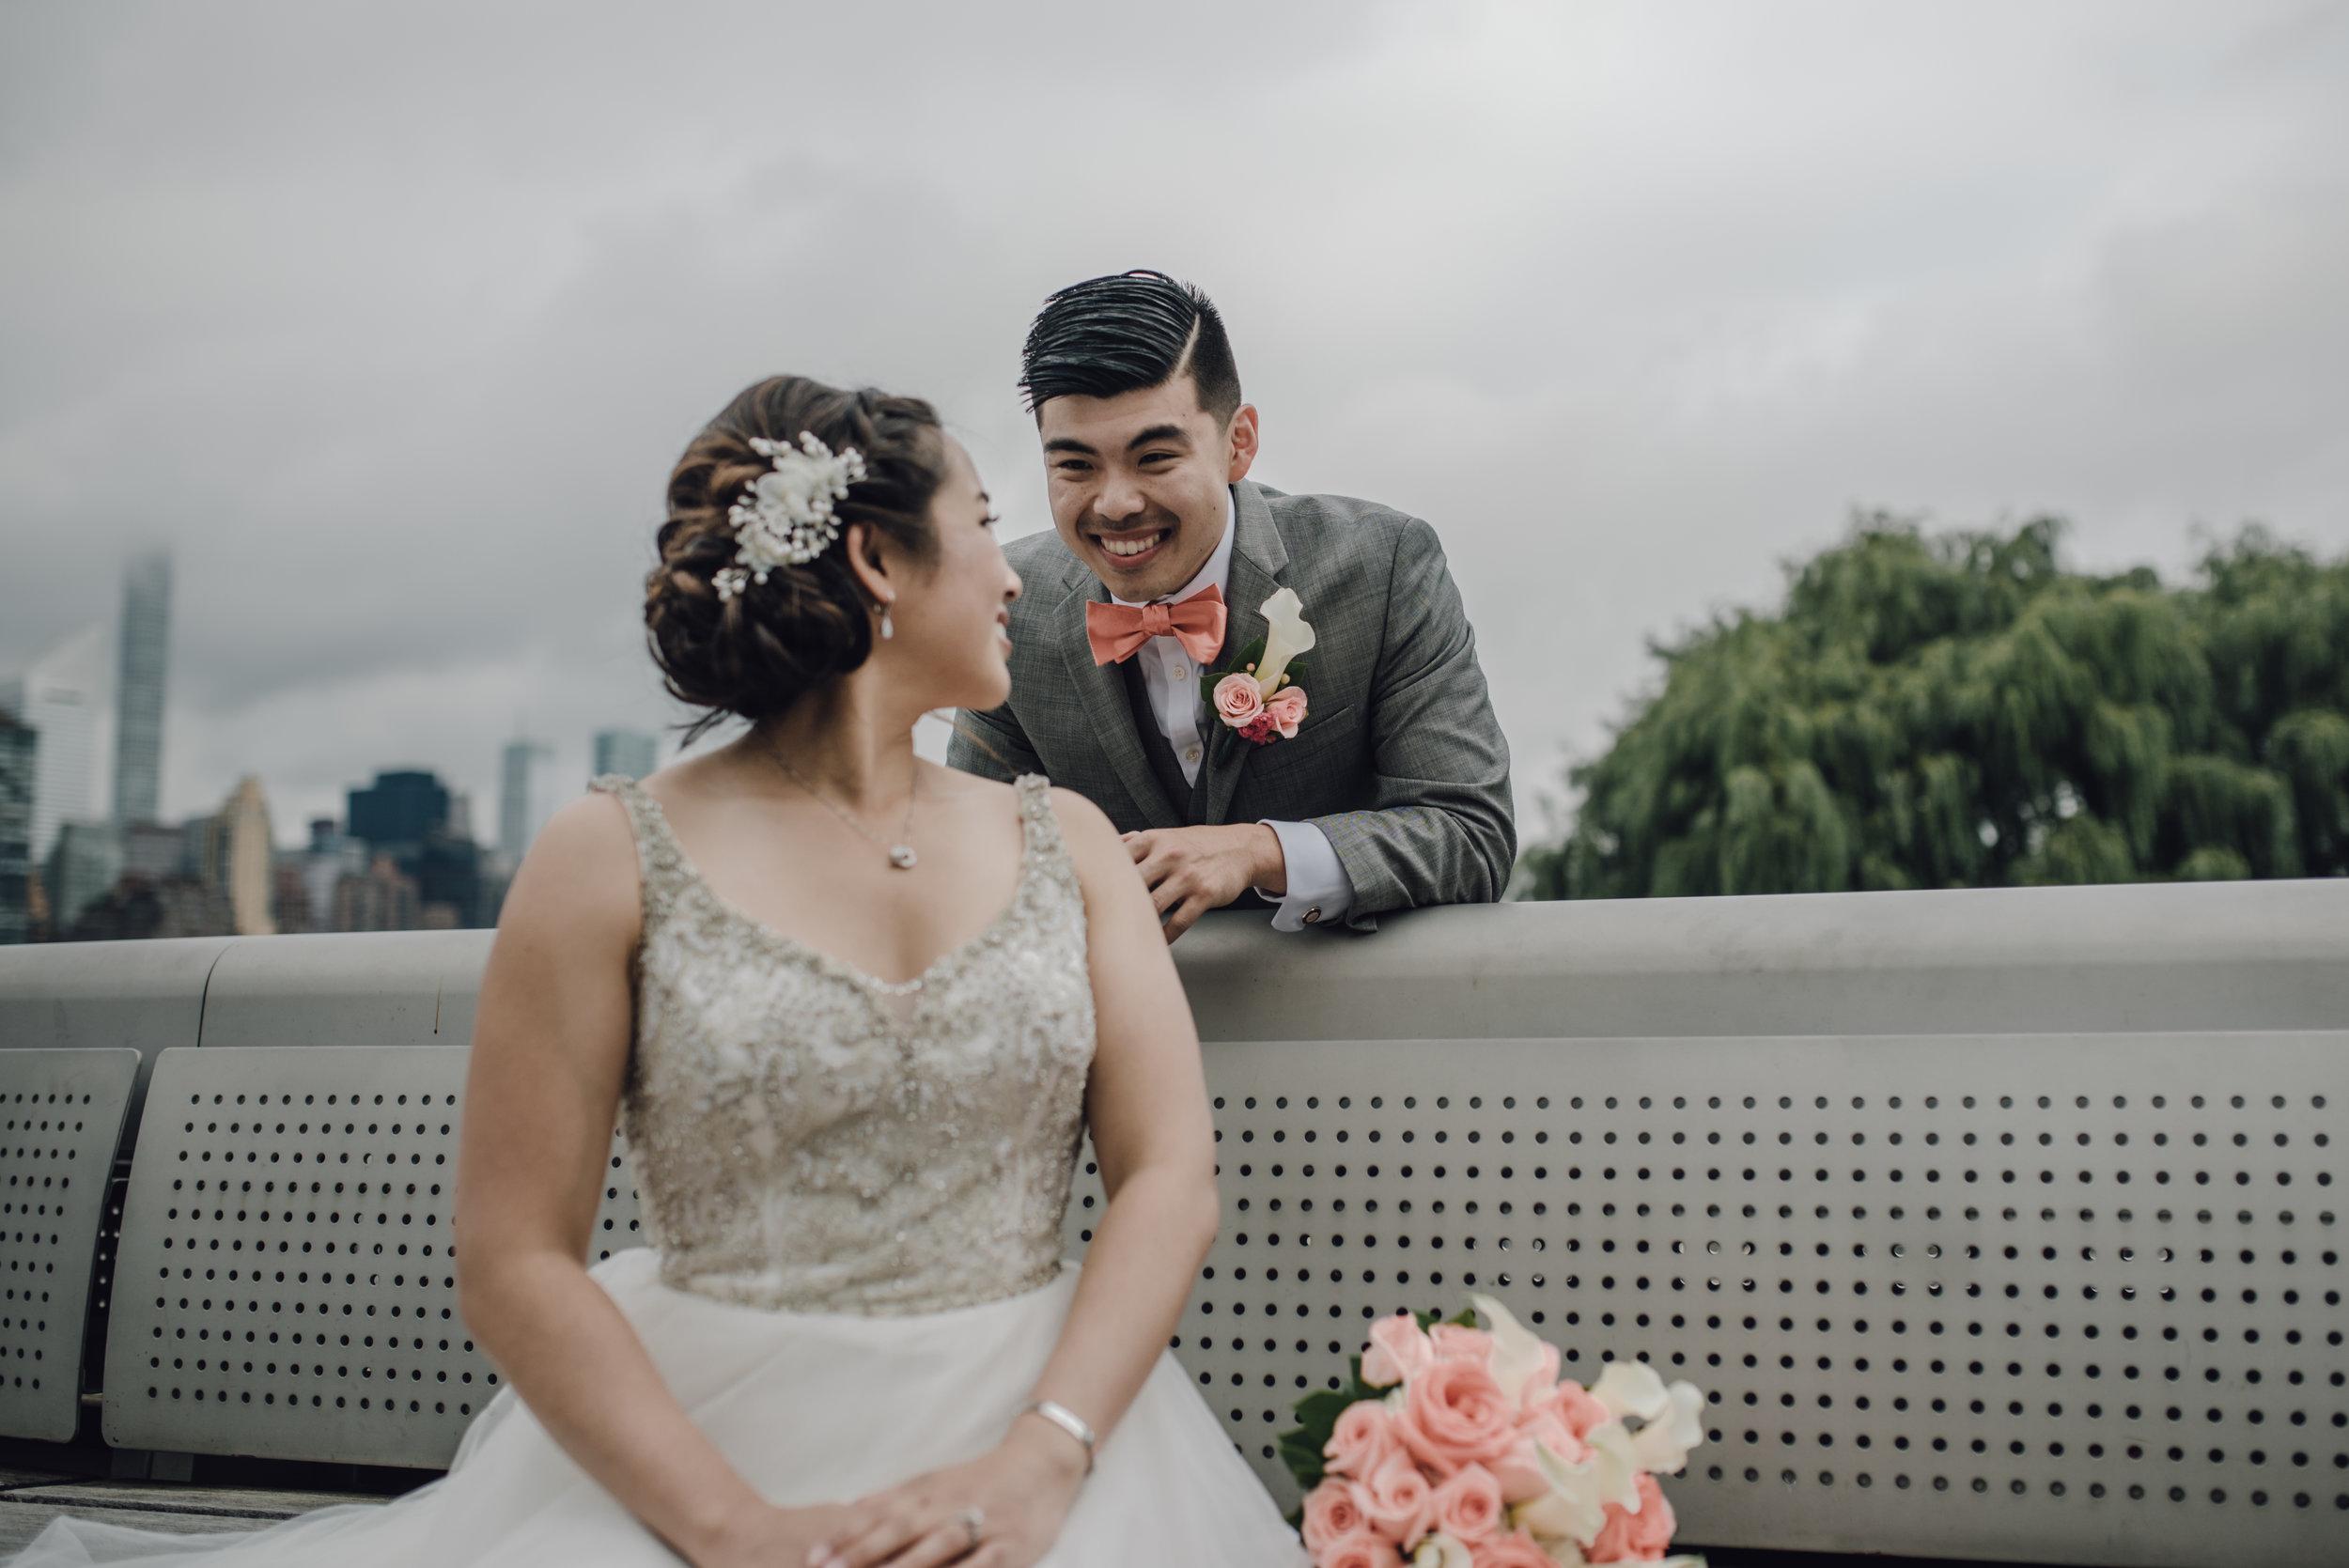 Main and Simple Photography_2017_Weddings_NewYork_TinaJon-550.jpg